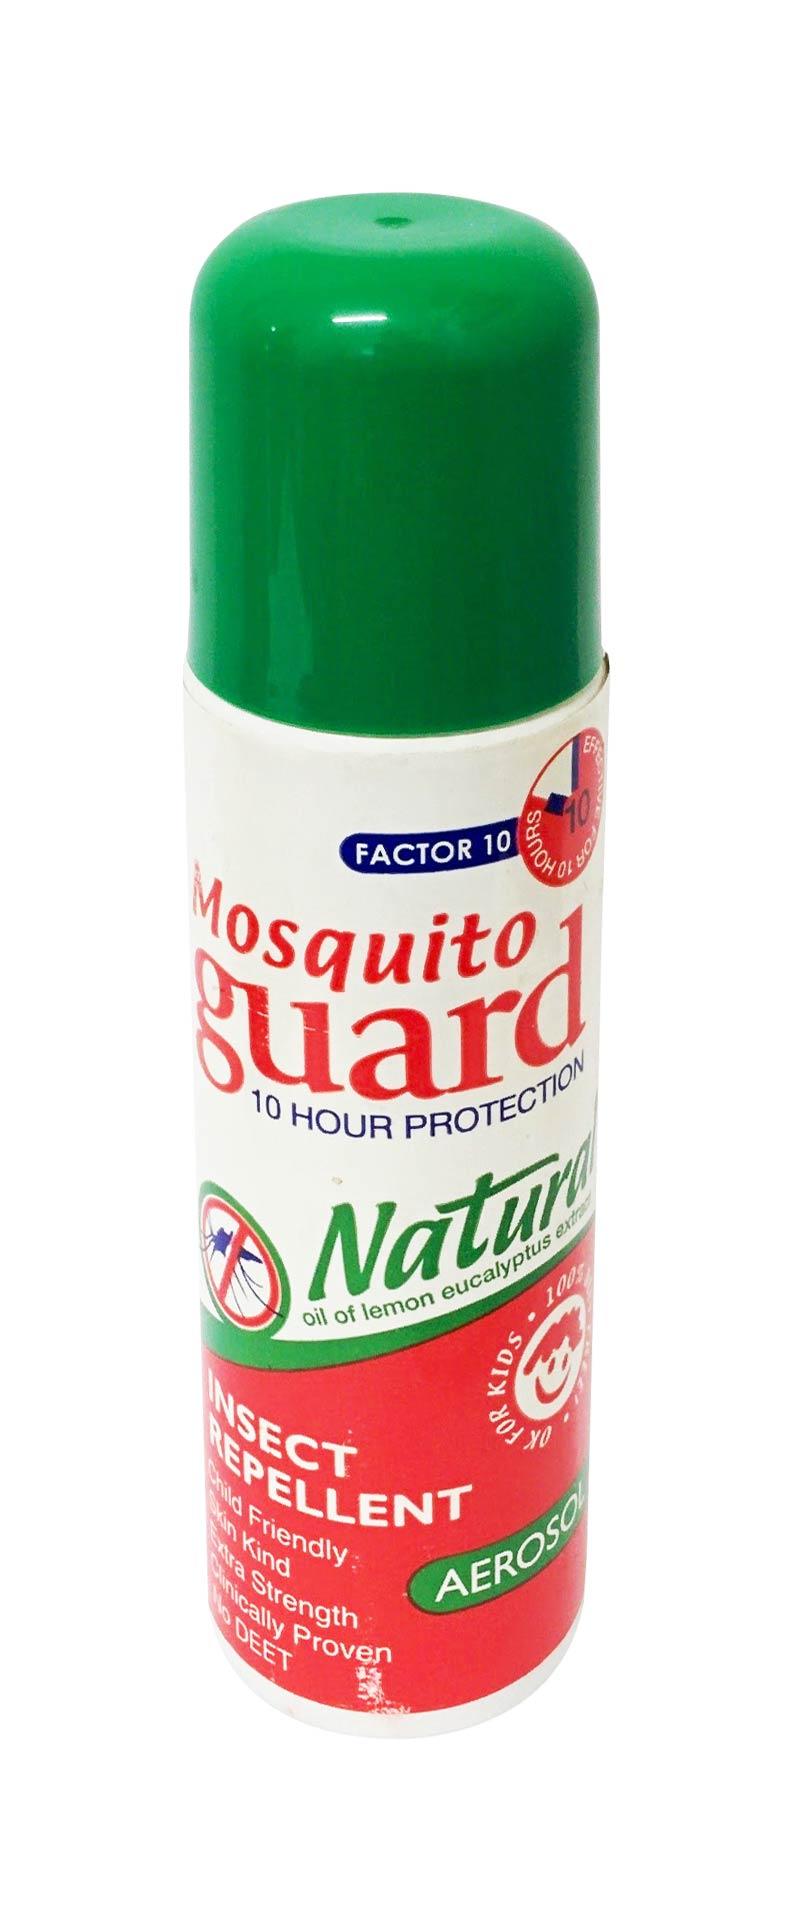 MosquitoGaurd_InspectRepellent.jpg